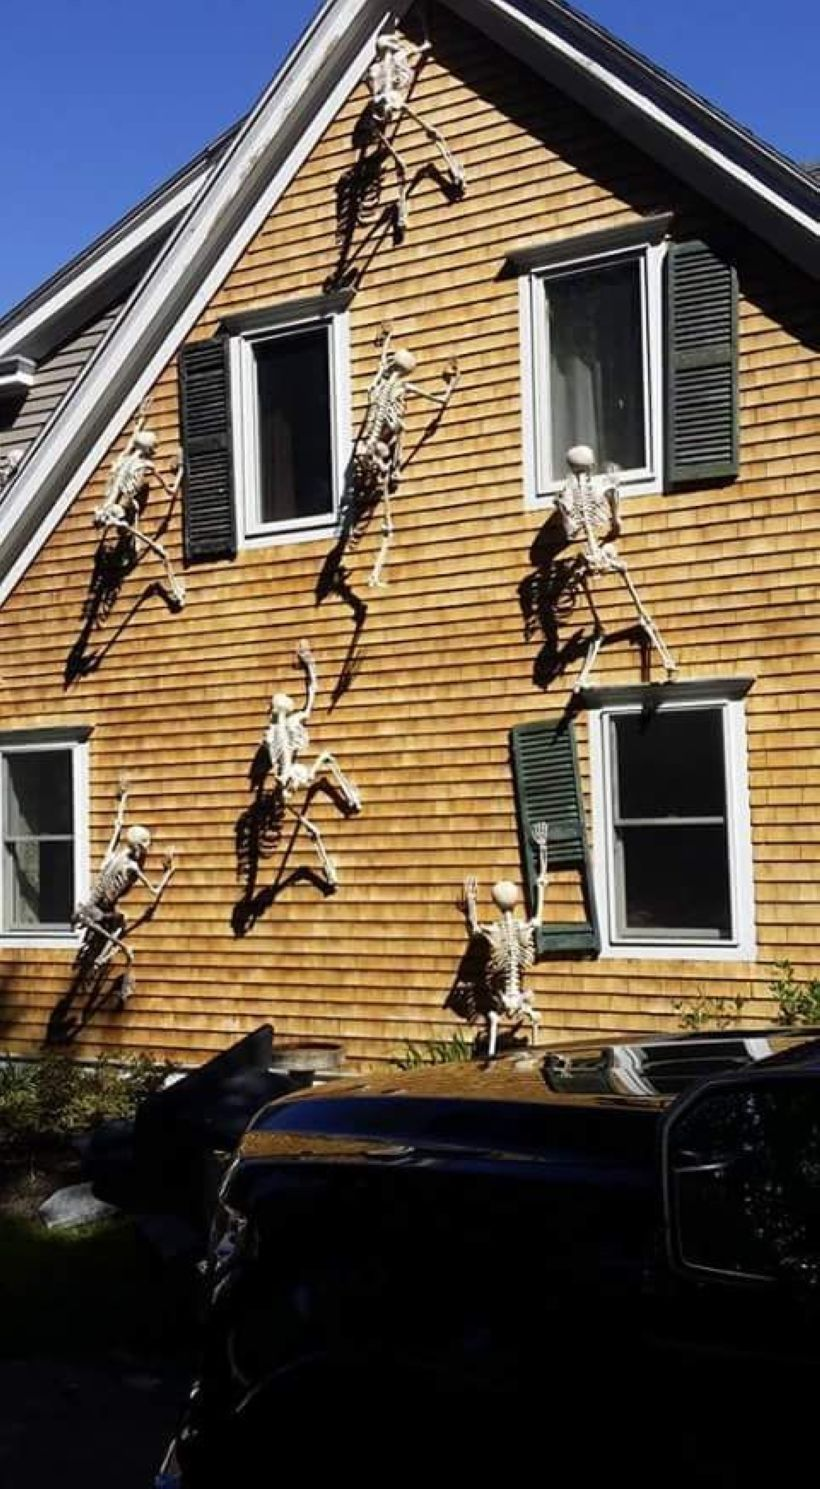 56 Great Halloween Home Decor Ideas To Make Halloween Outdoor Decorations Scary Halloween Decorations Outdoor Scary Halloween Decorations